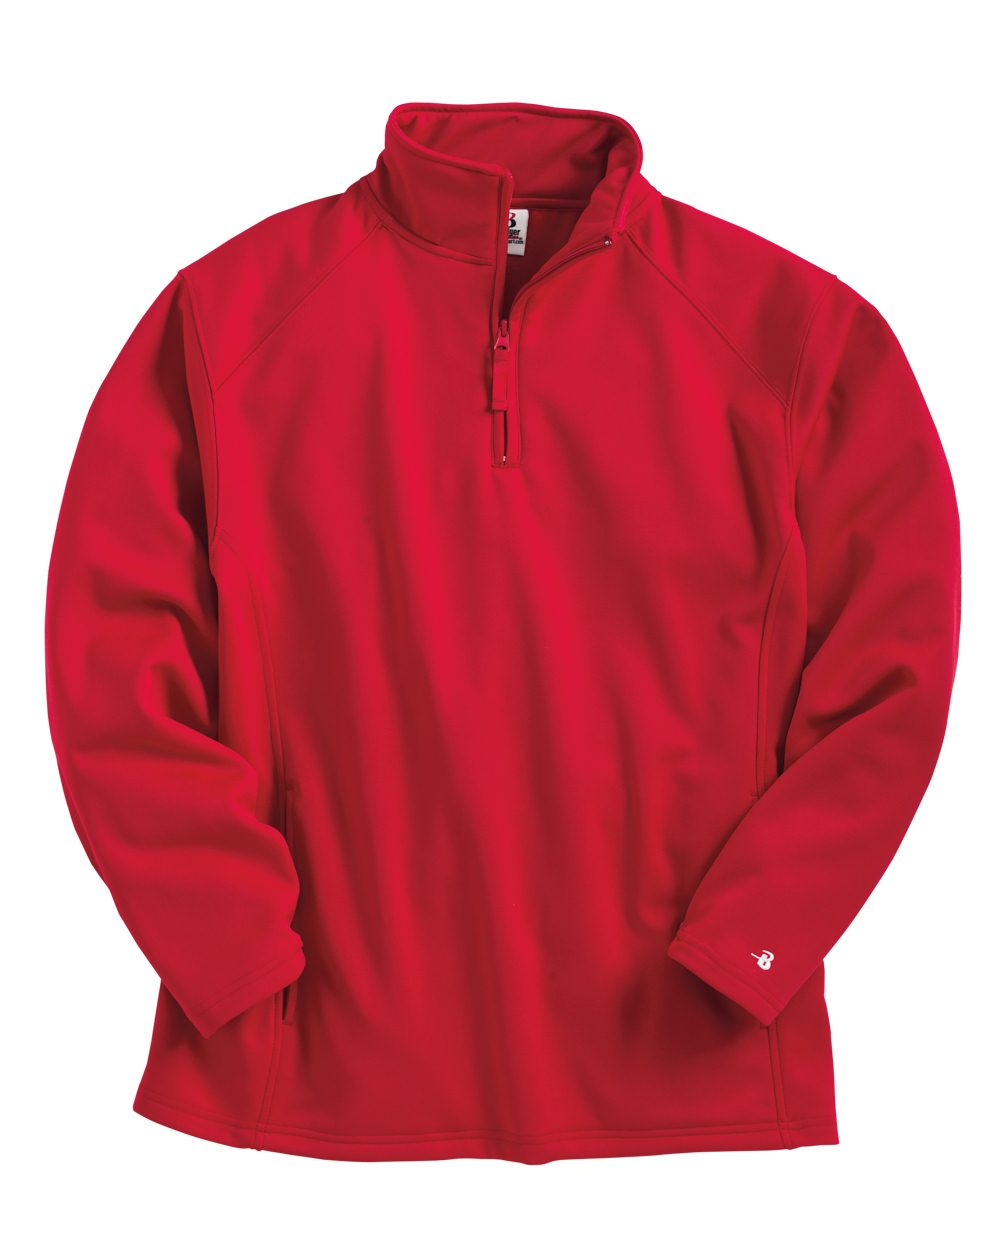 Badger Polyester Fleece Quarter-Zip Pullover - 1480